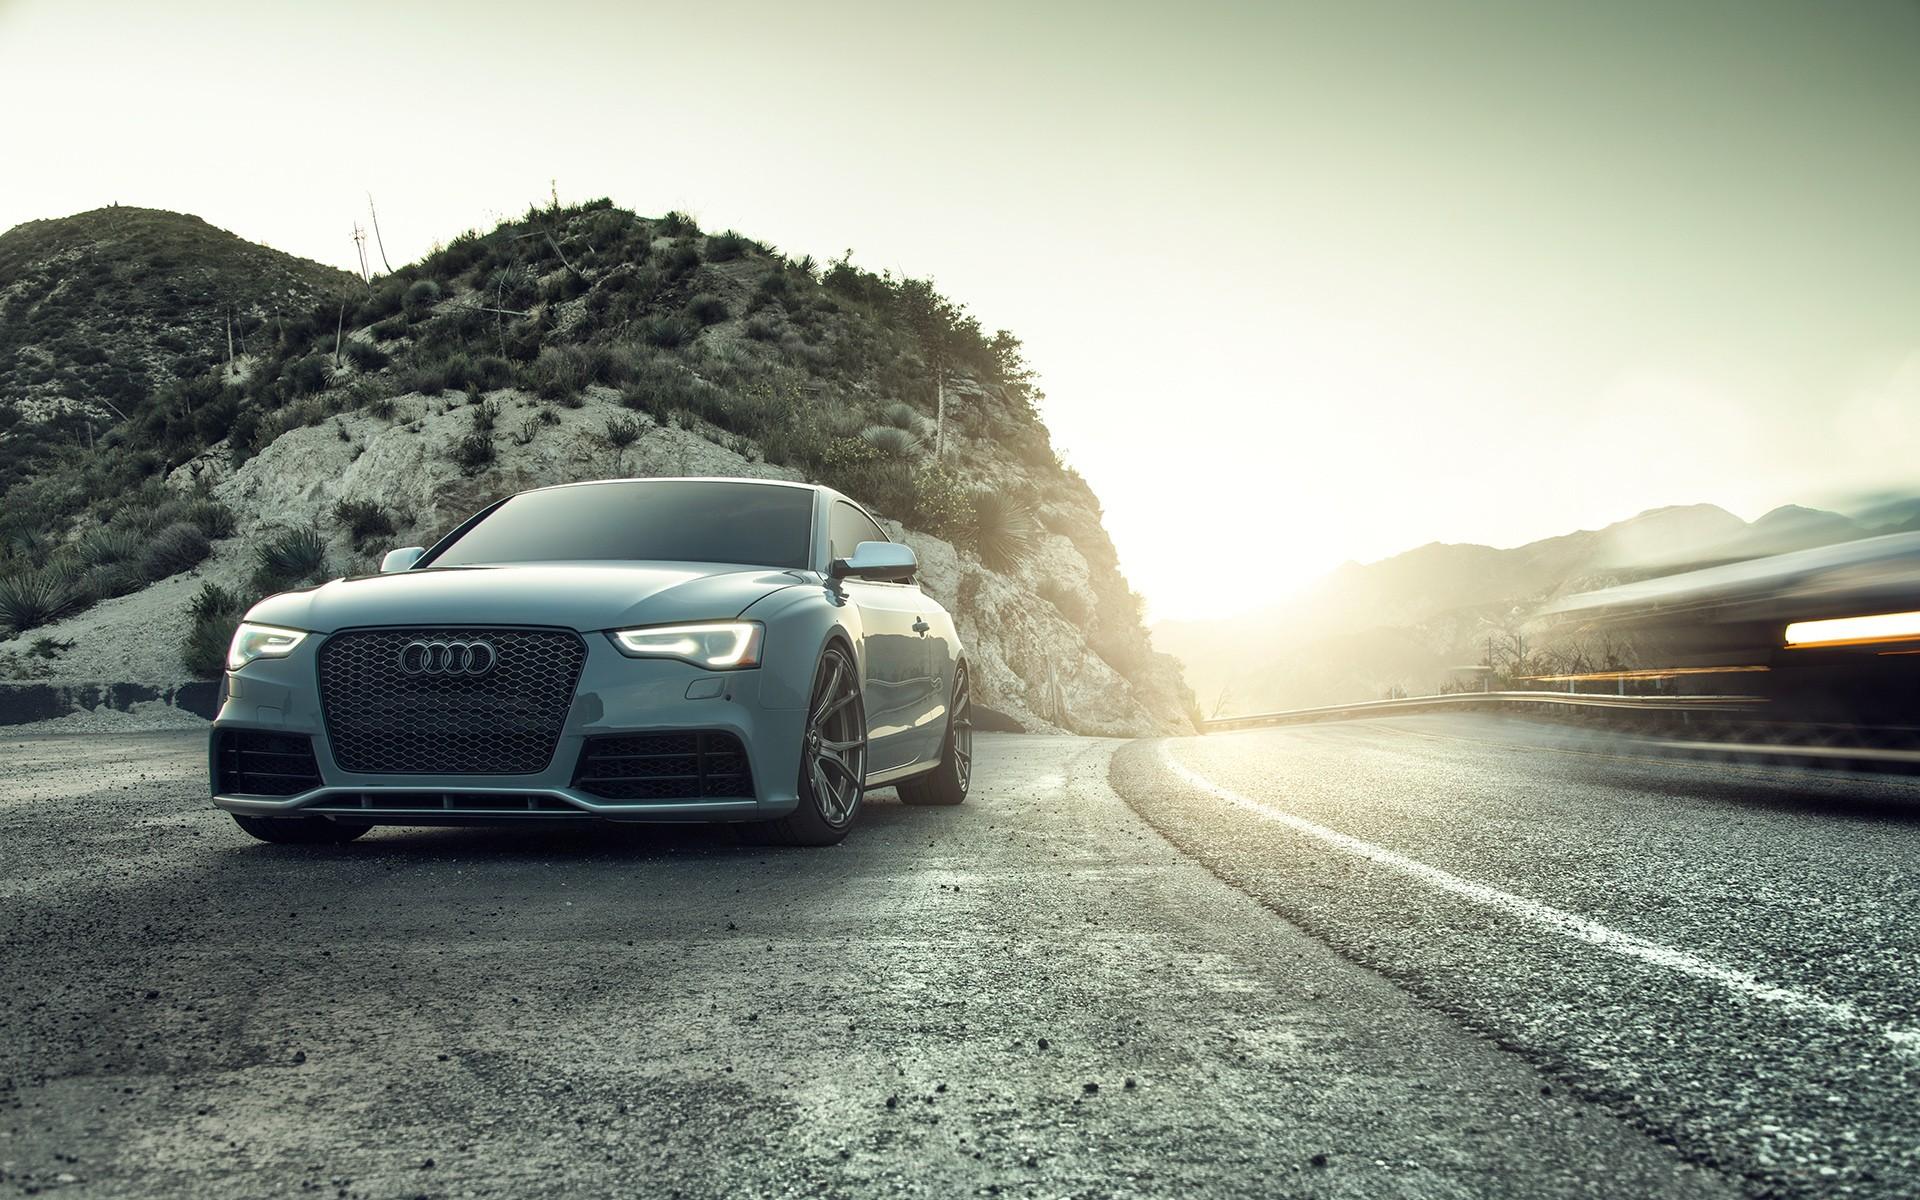 Audi A6 Wallpaper Hd Vorsteiner Audi S5 A5 Series Wallpaper Hd Car Wallpapers